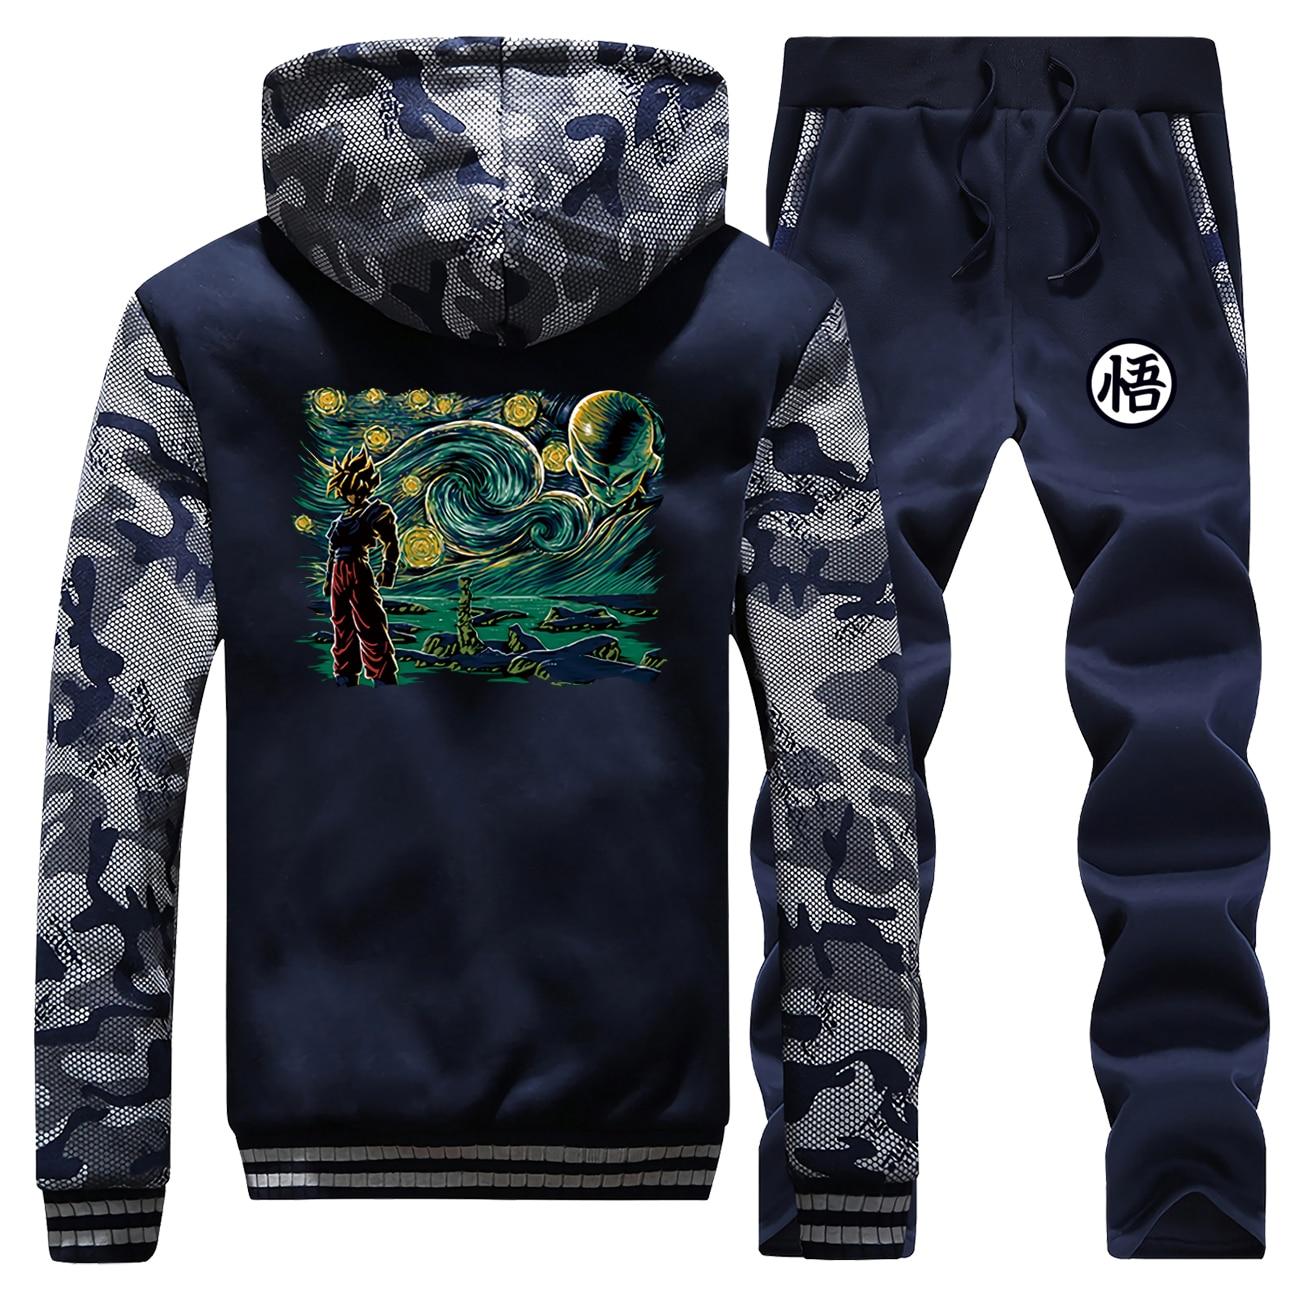 Van Gogh's Dragon Ball Camo Male Set Japan Anime Vintage Thick Jacket Set Men 2019 Winter Fleece Pants Sweatshirts Warm Gym Suit